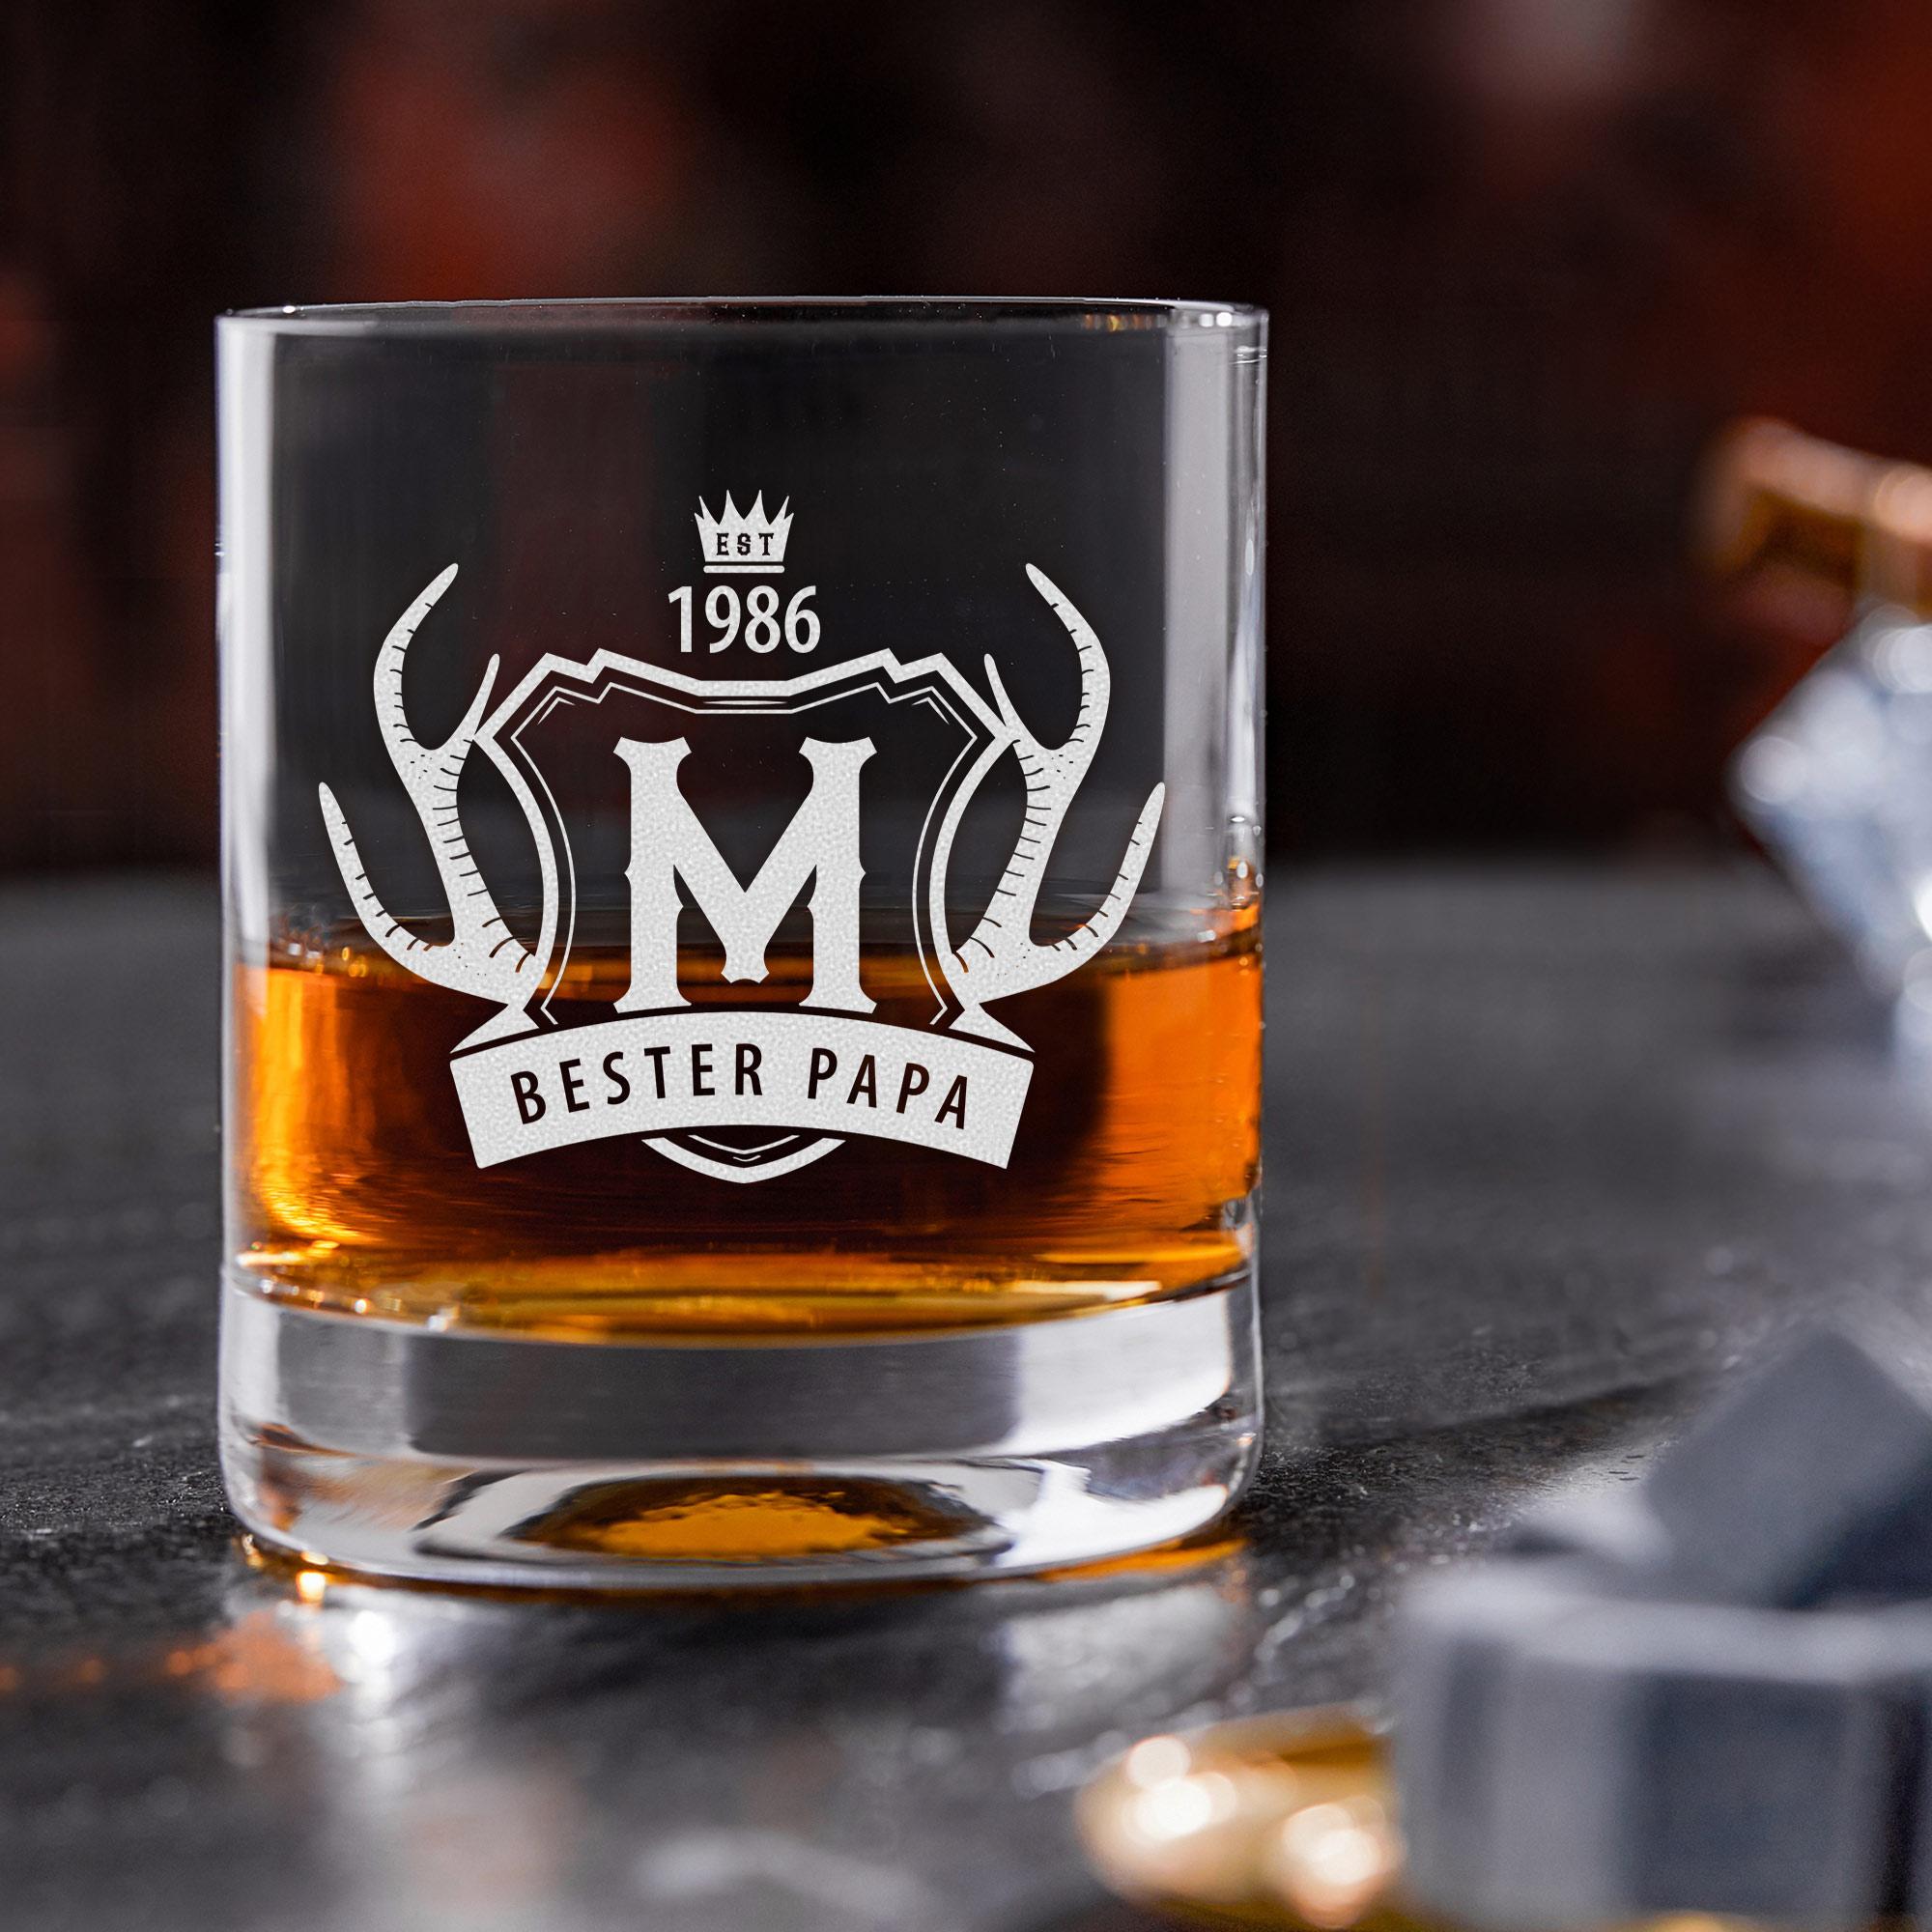 Personalisiertes Whiskyglas mit Gravur Bester Papa - Geweih